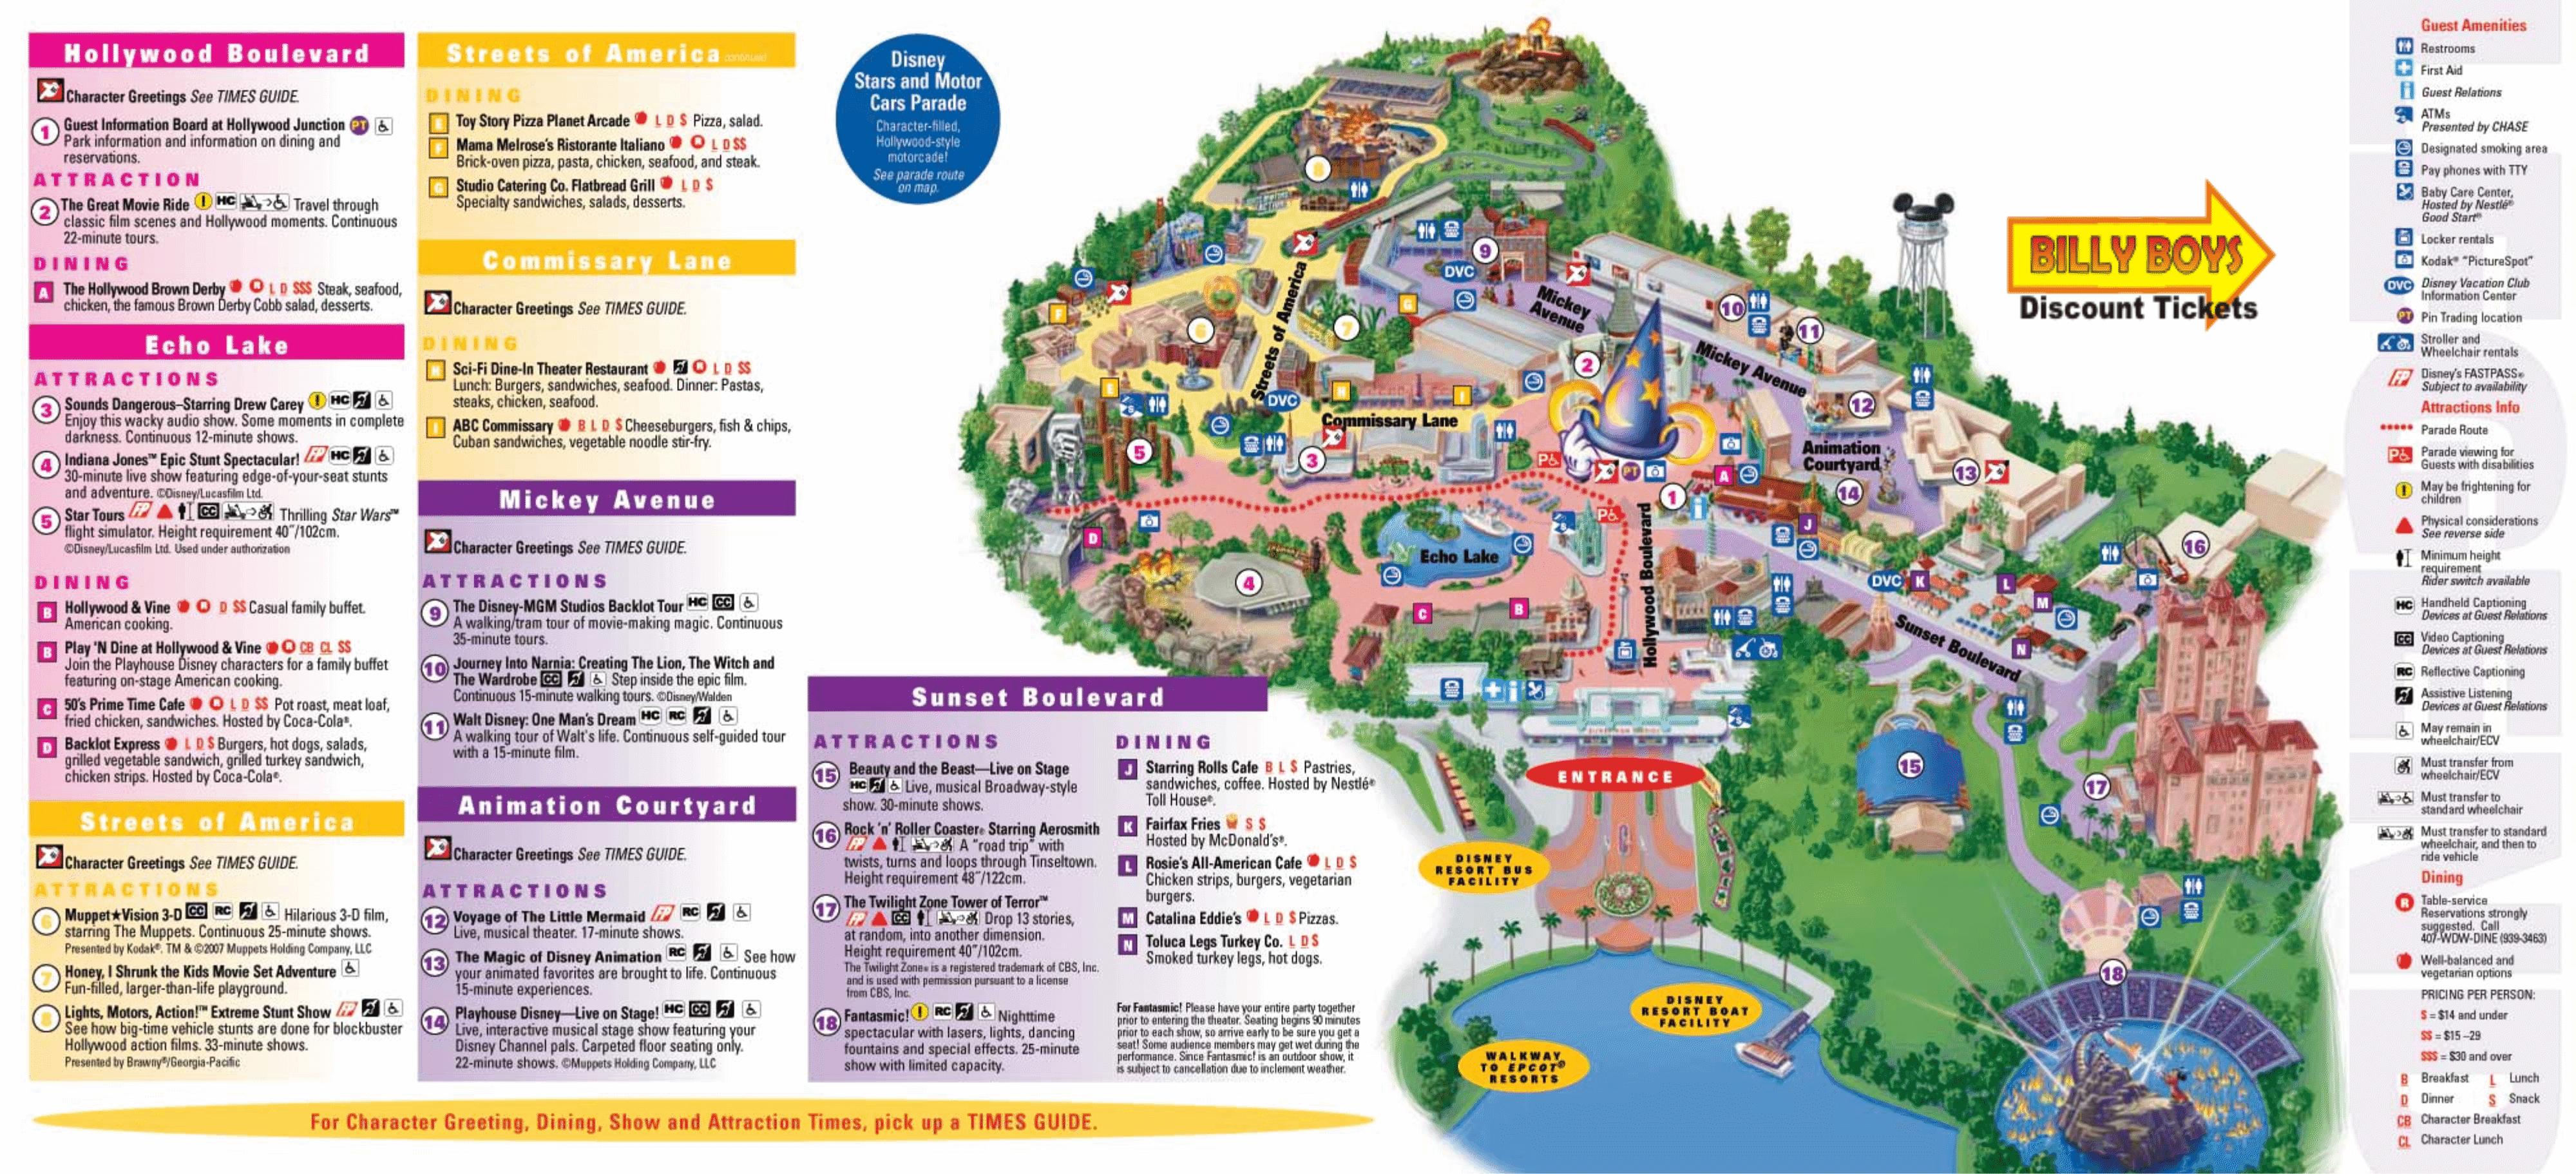 Universal Studios In Hollywood Tourist Google Maps California - Google Maps Orlando Florida